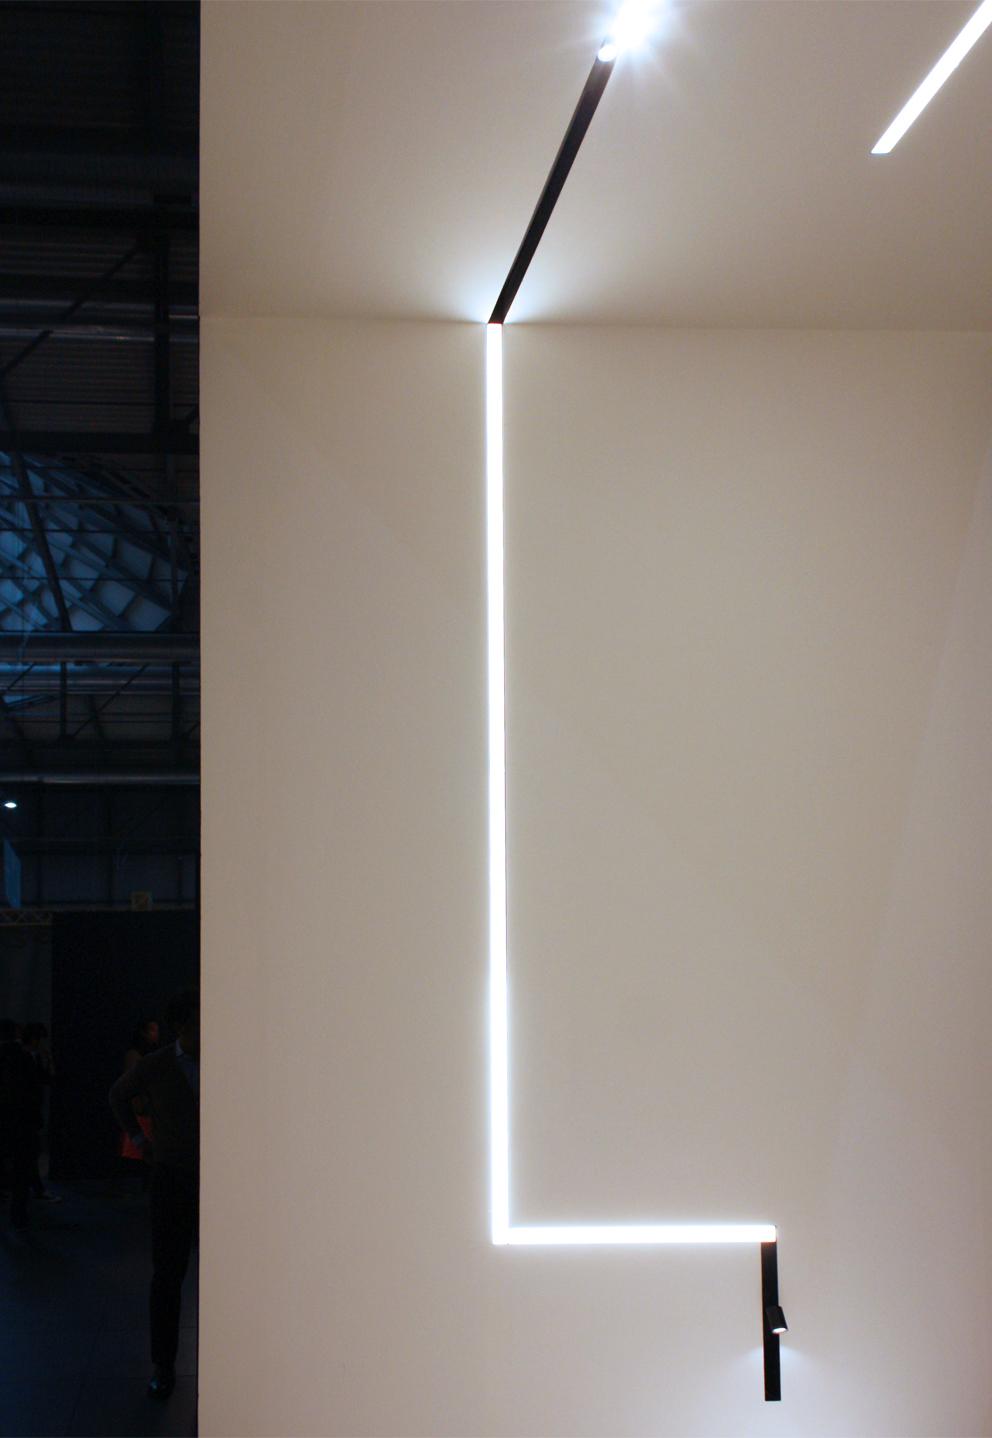 10 reasons to buy Led wall light strips | Warisan Lighting on Led Wall id=20822